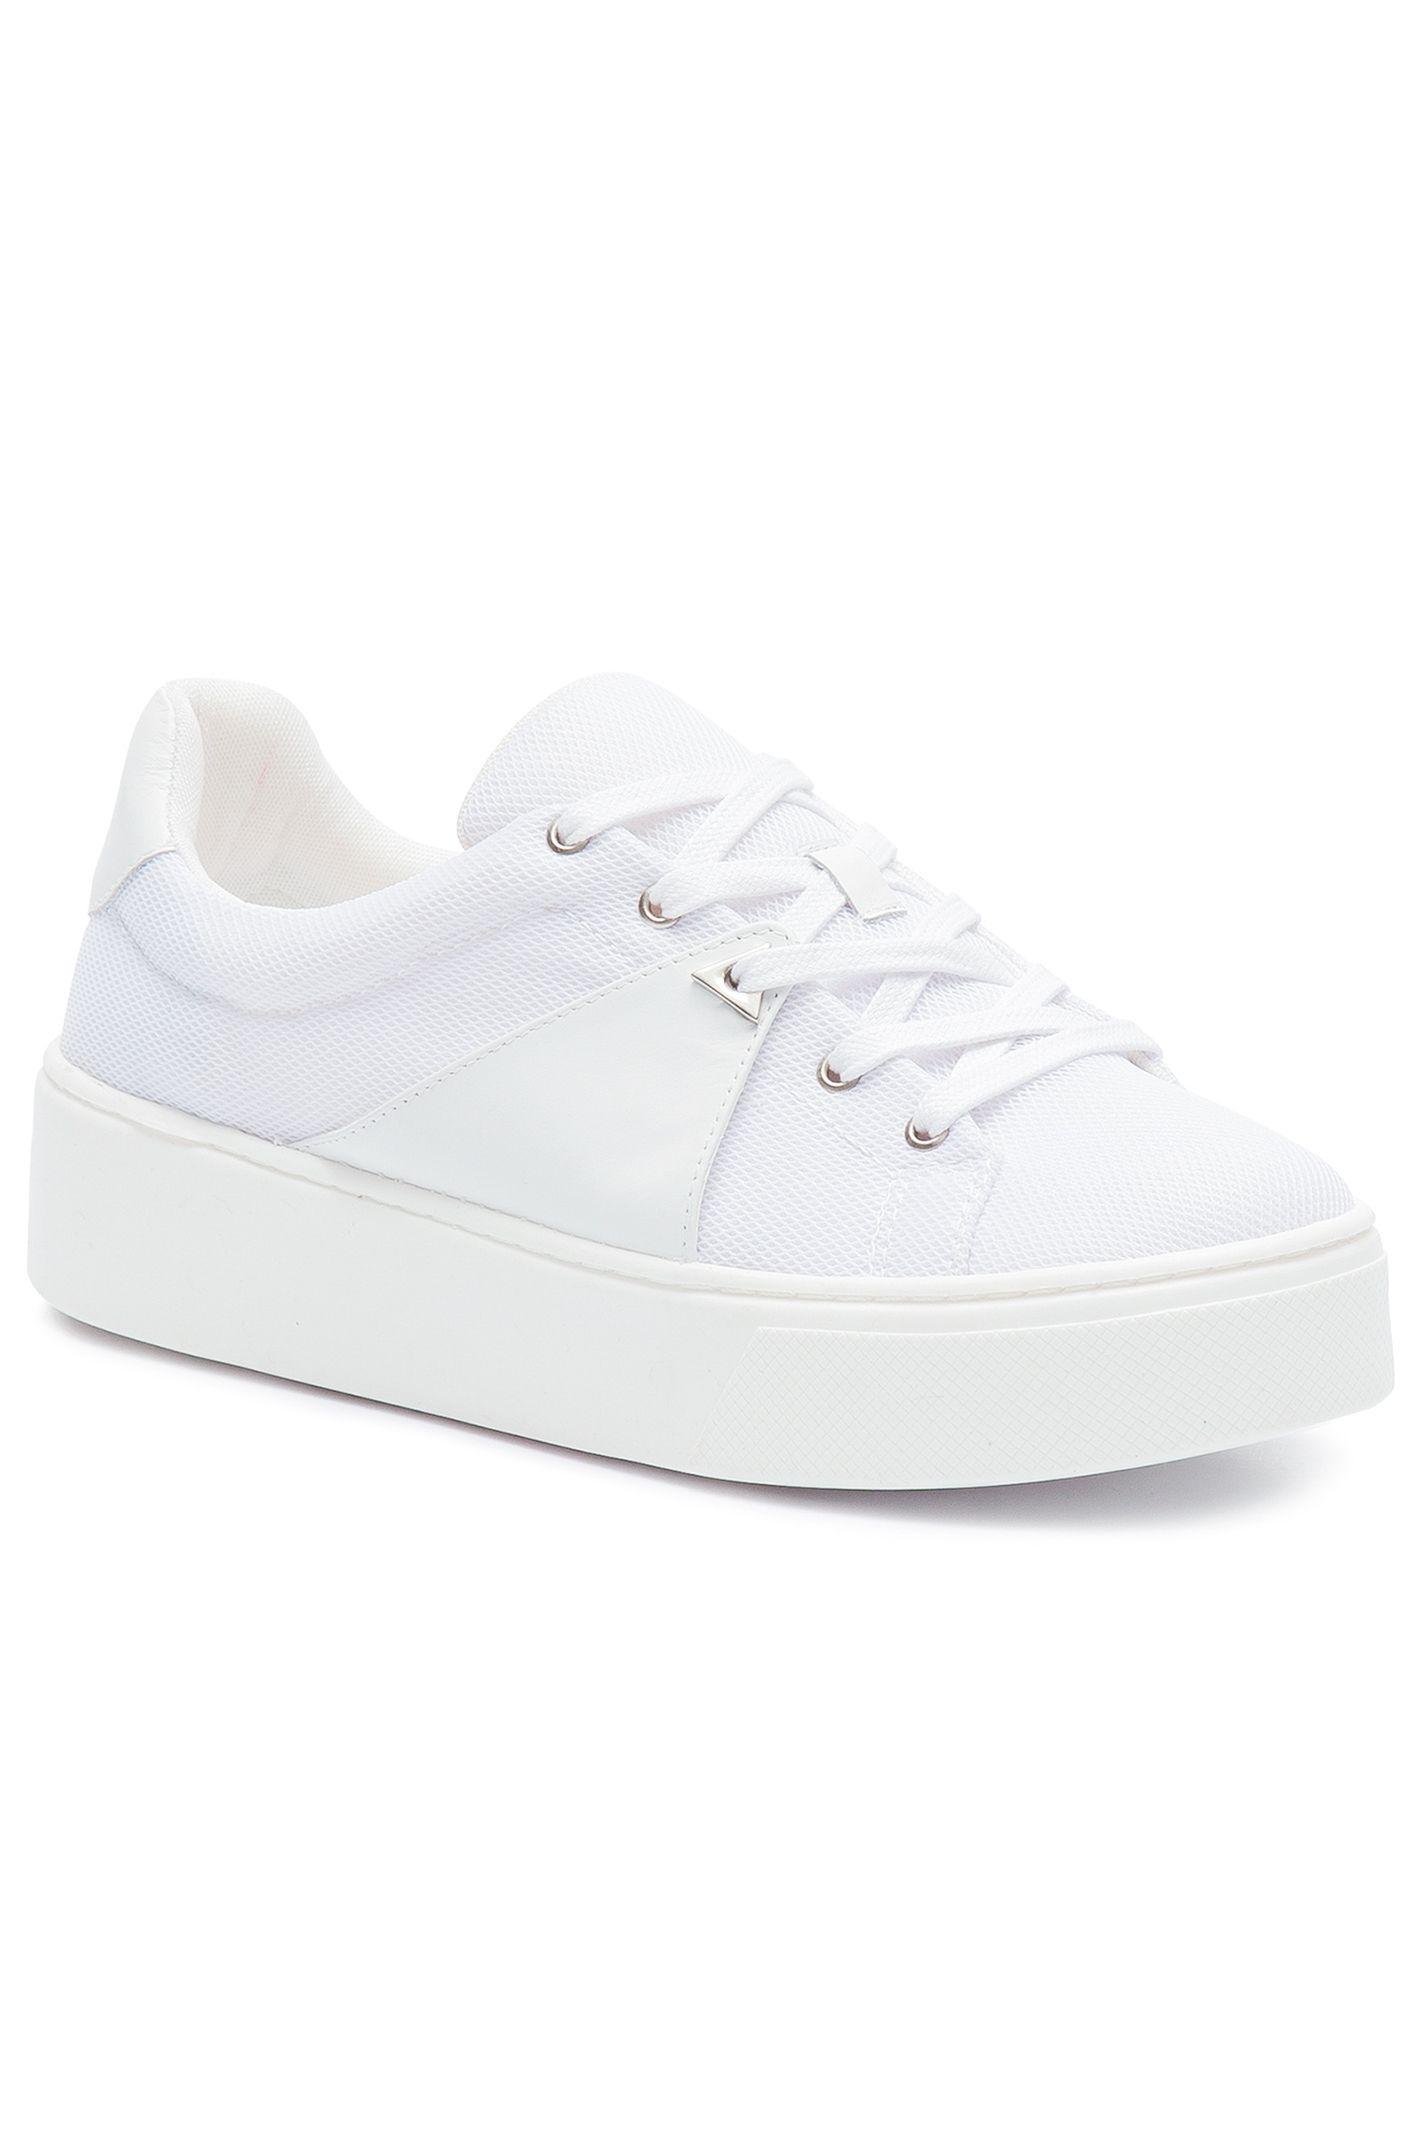 02ff6a9c1 SCHUTZTÊNIS FLATFORM SNEAKER LOW SCHUTZ - BRANCO | Shoes em 2019 ...